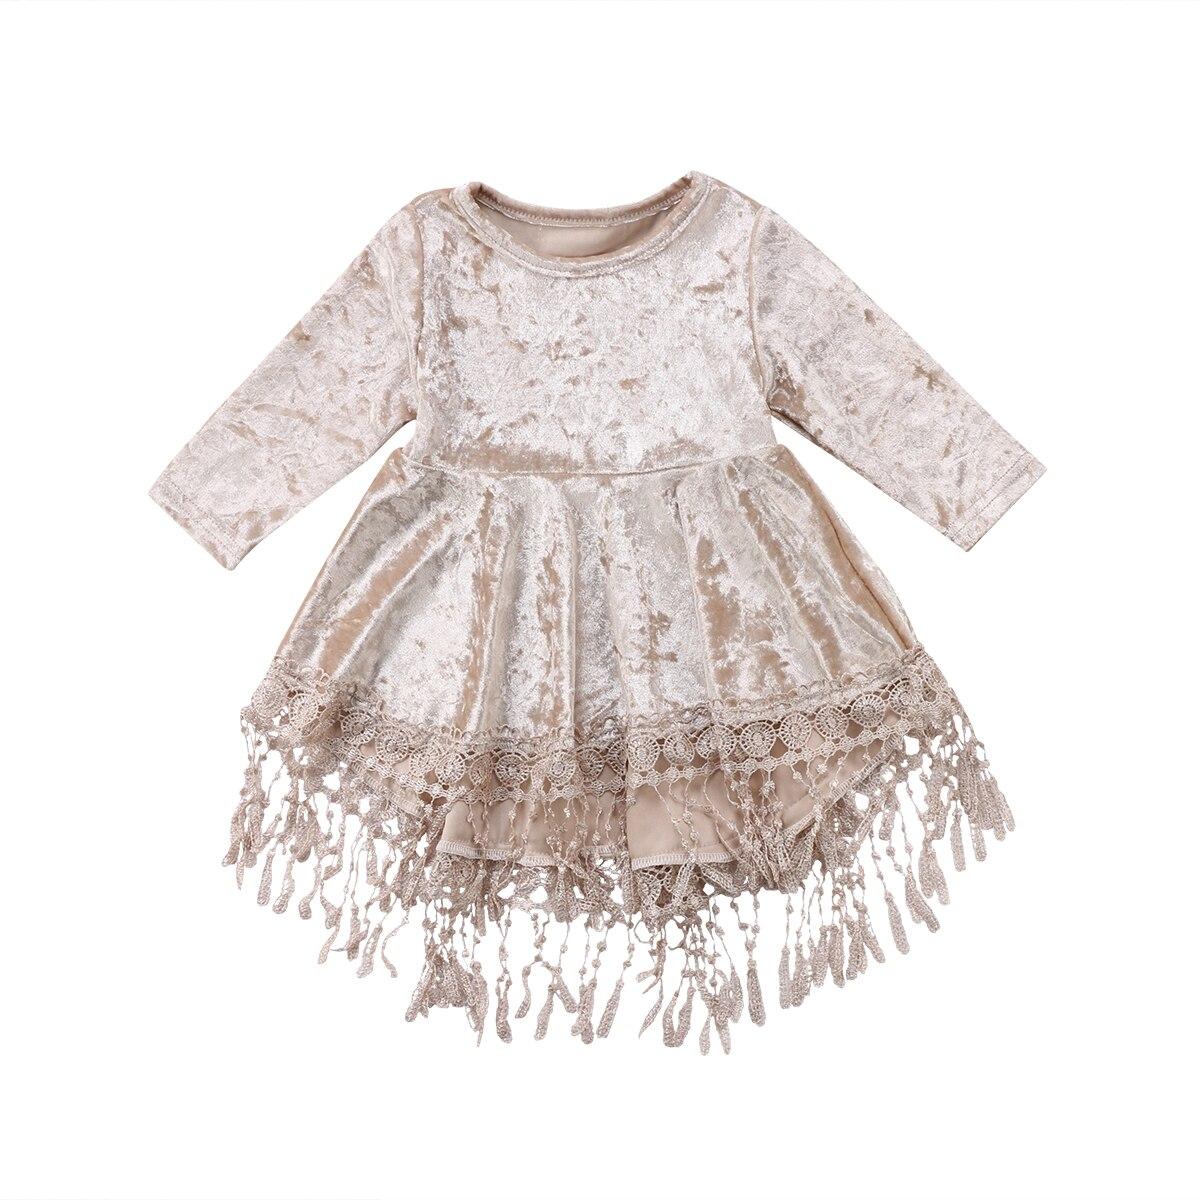 Fashion   Flower     Girl     Dress   Velvet Tassel Princess Baby Party Pageant Gown Formal   Dress